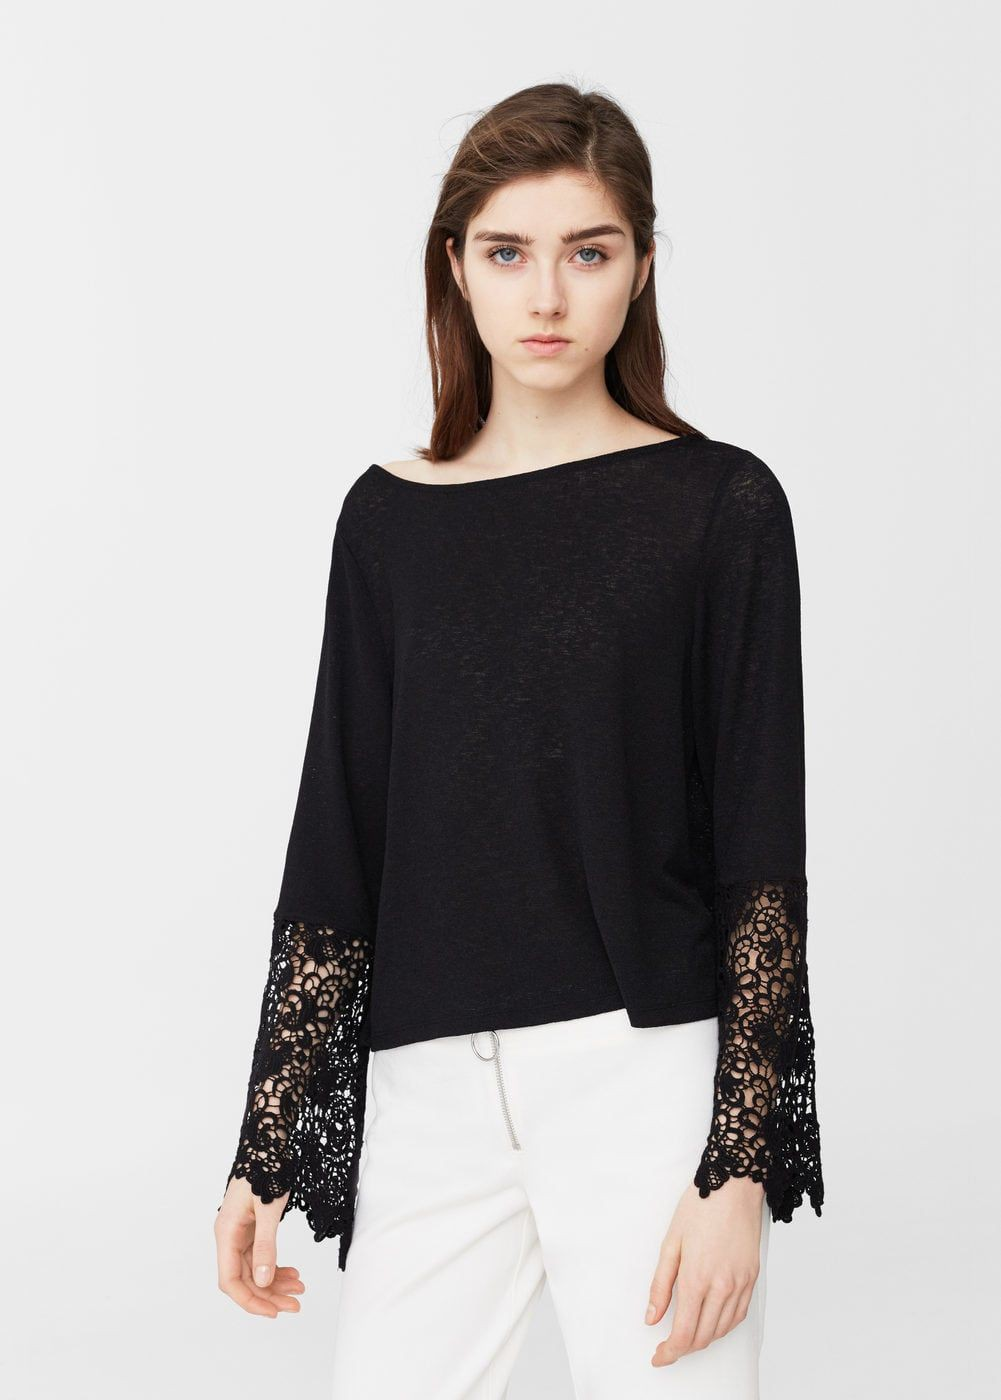 Black colour dress with blouse, shirt, top